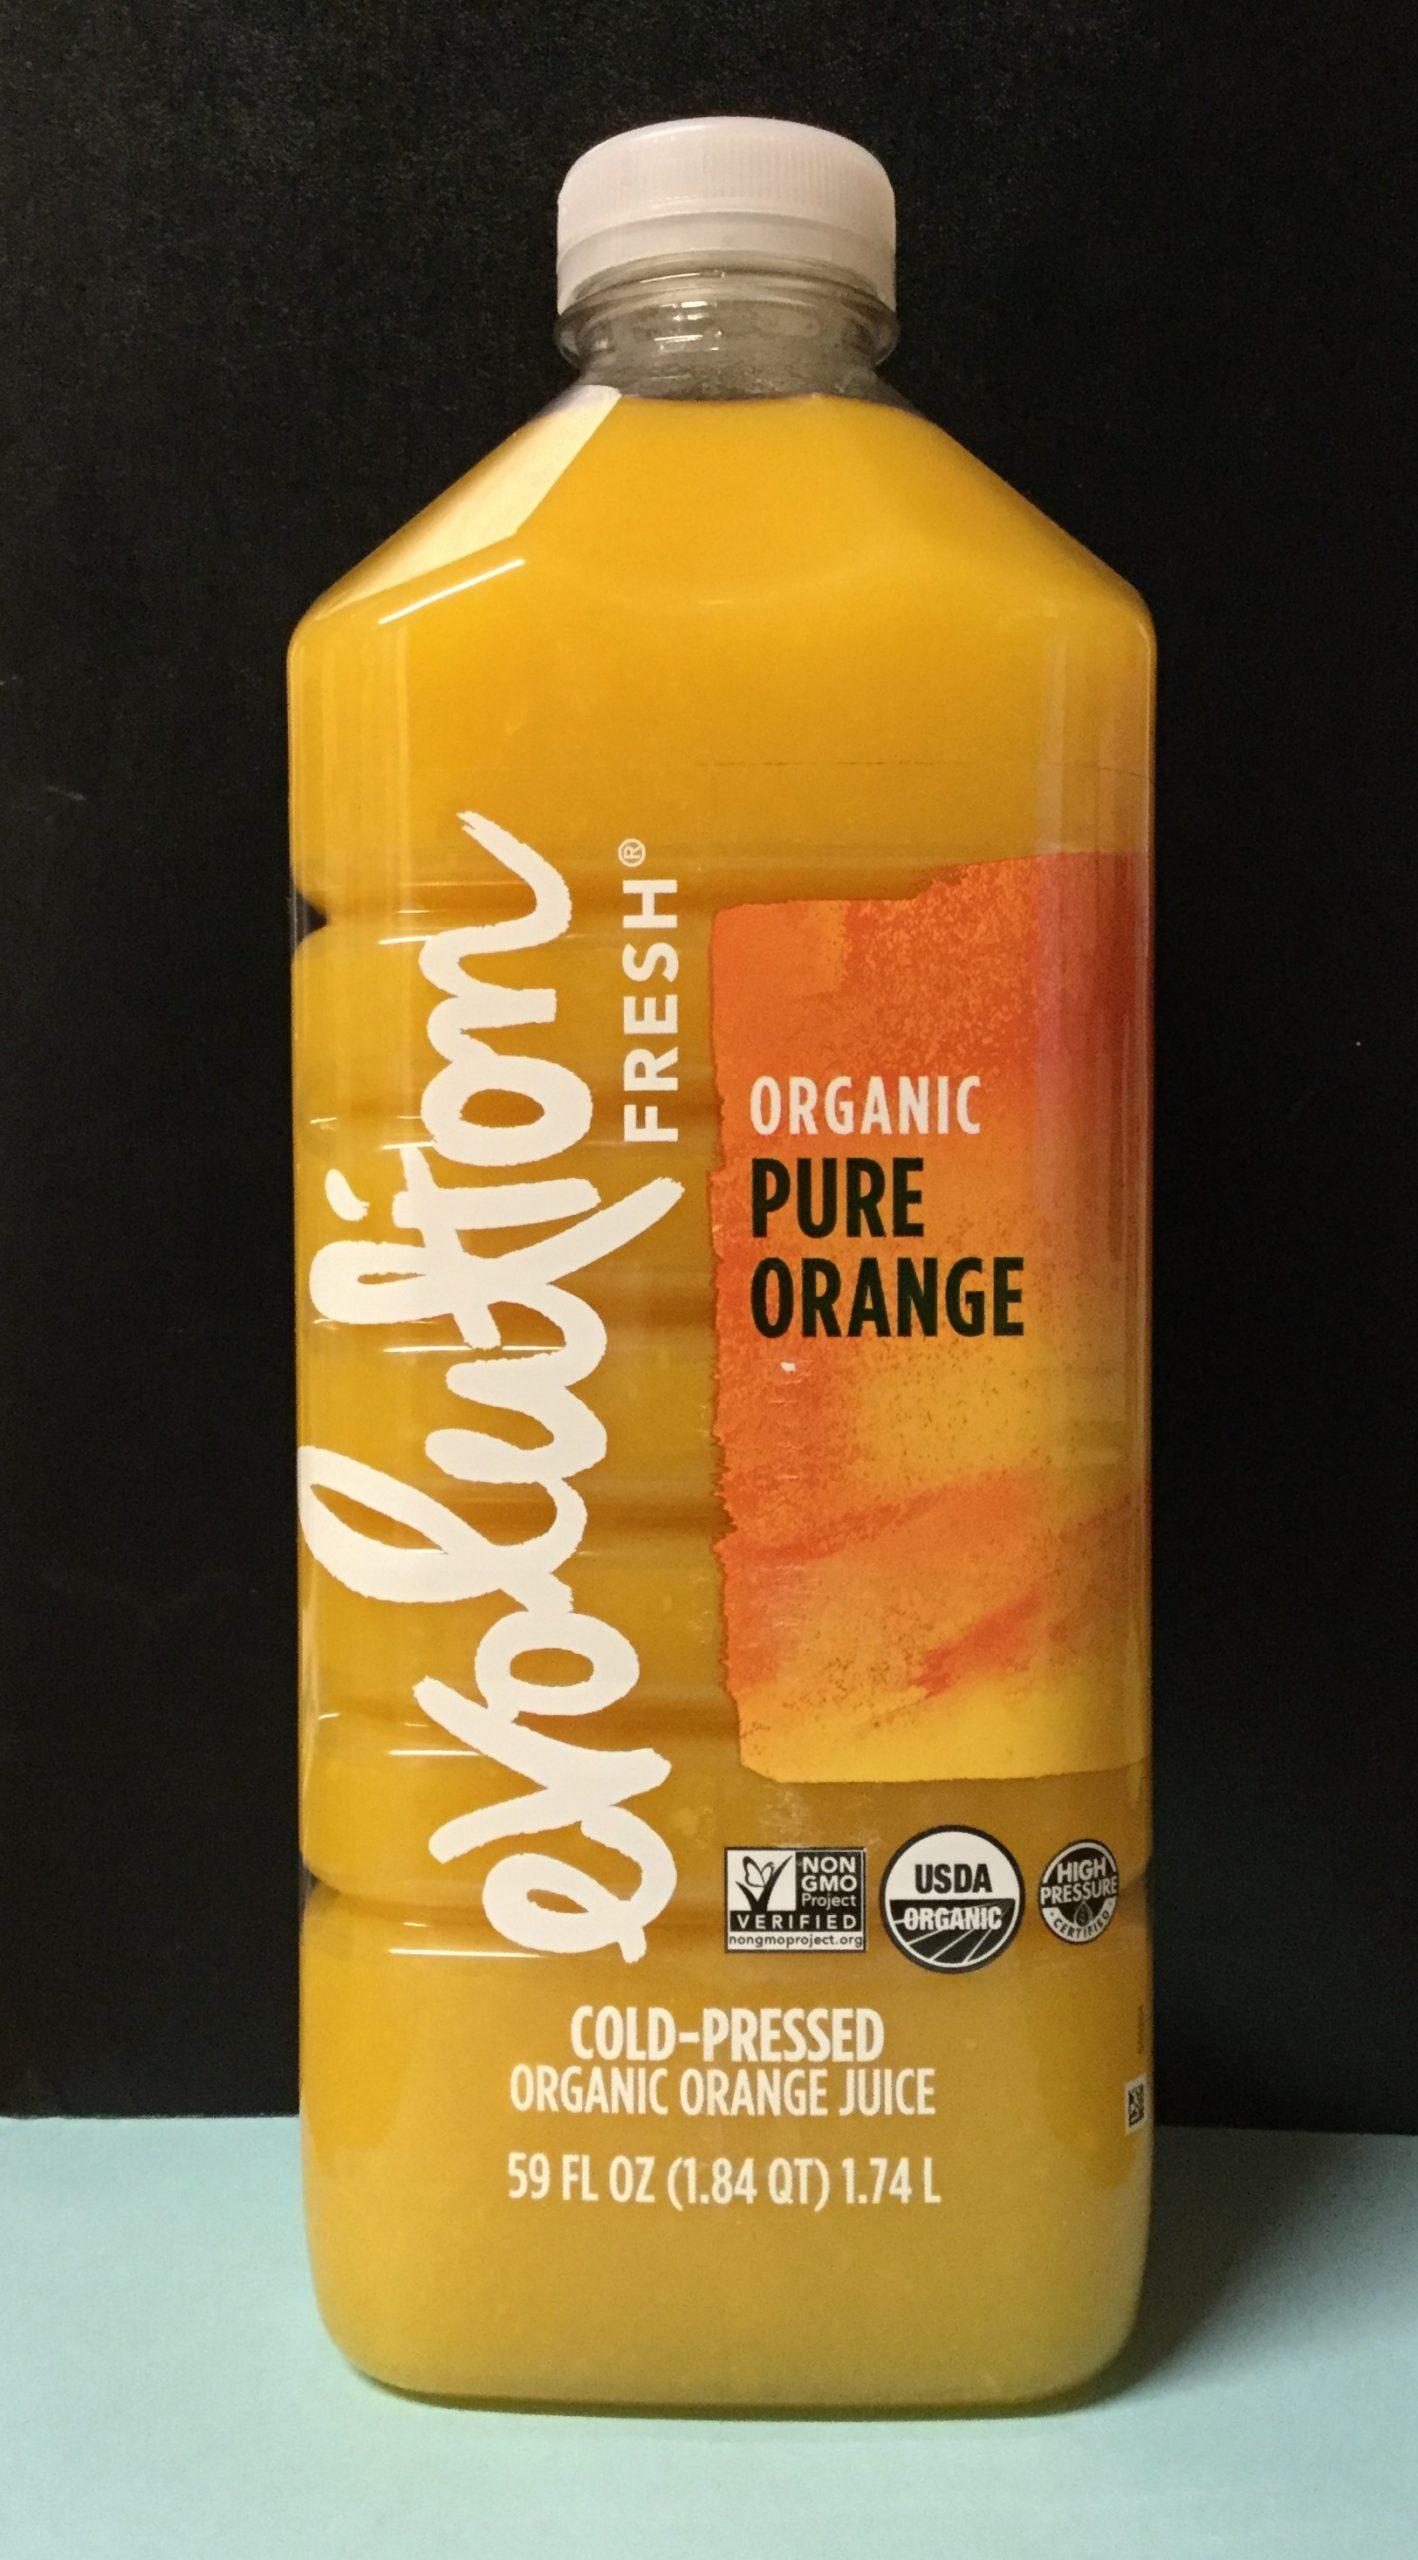 EVOLUTION Cold-Pressed Organic Orange Juice